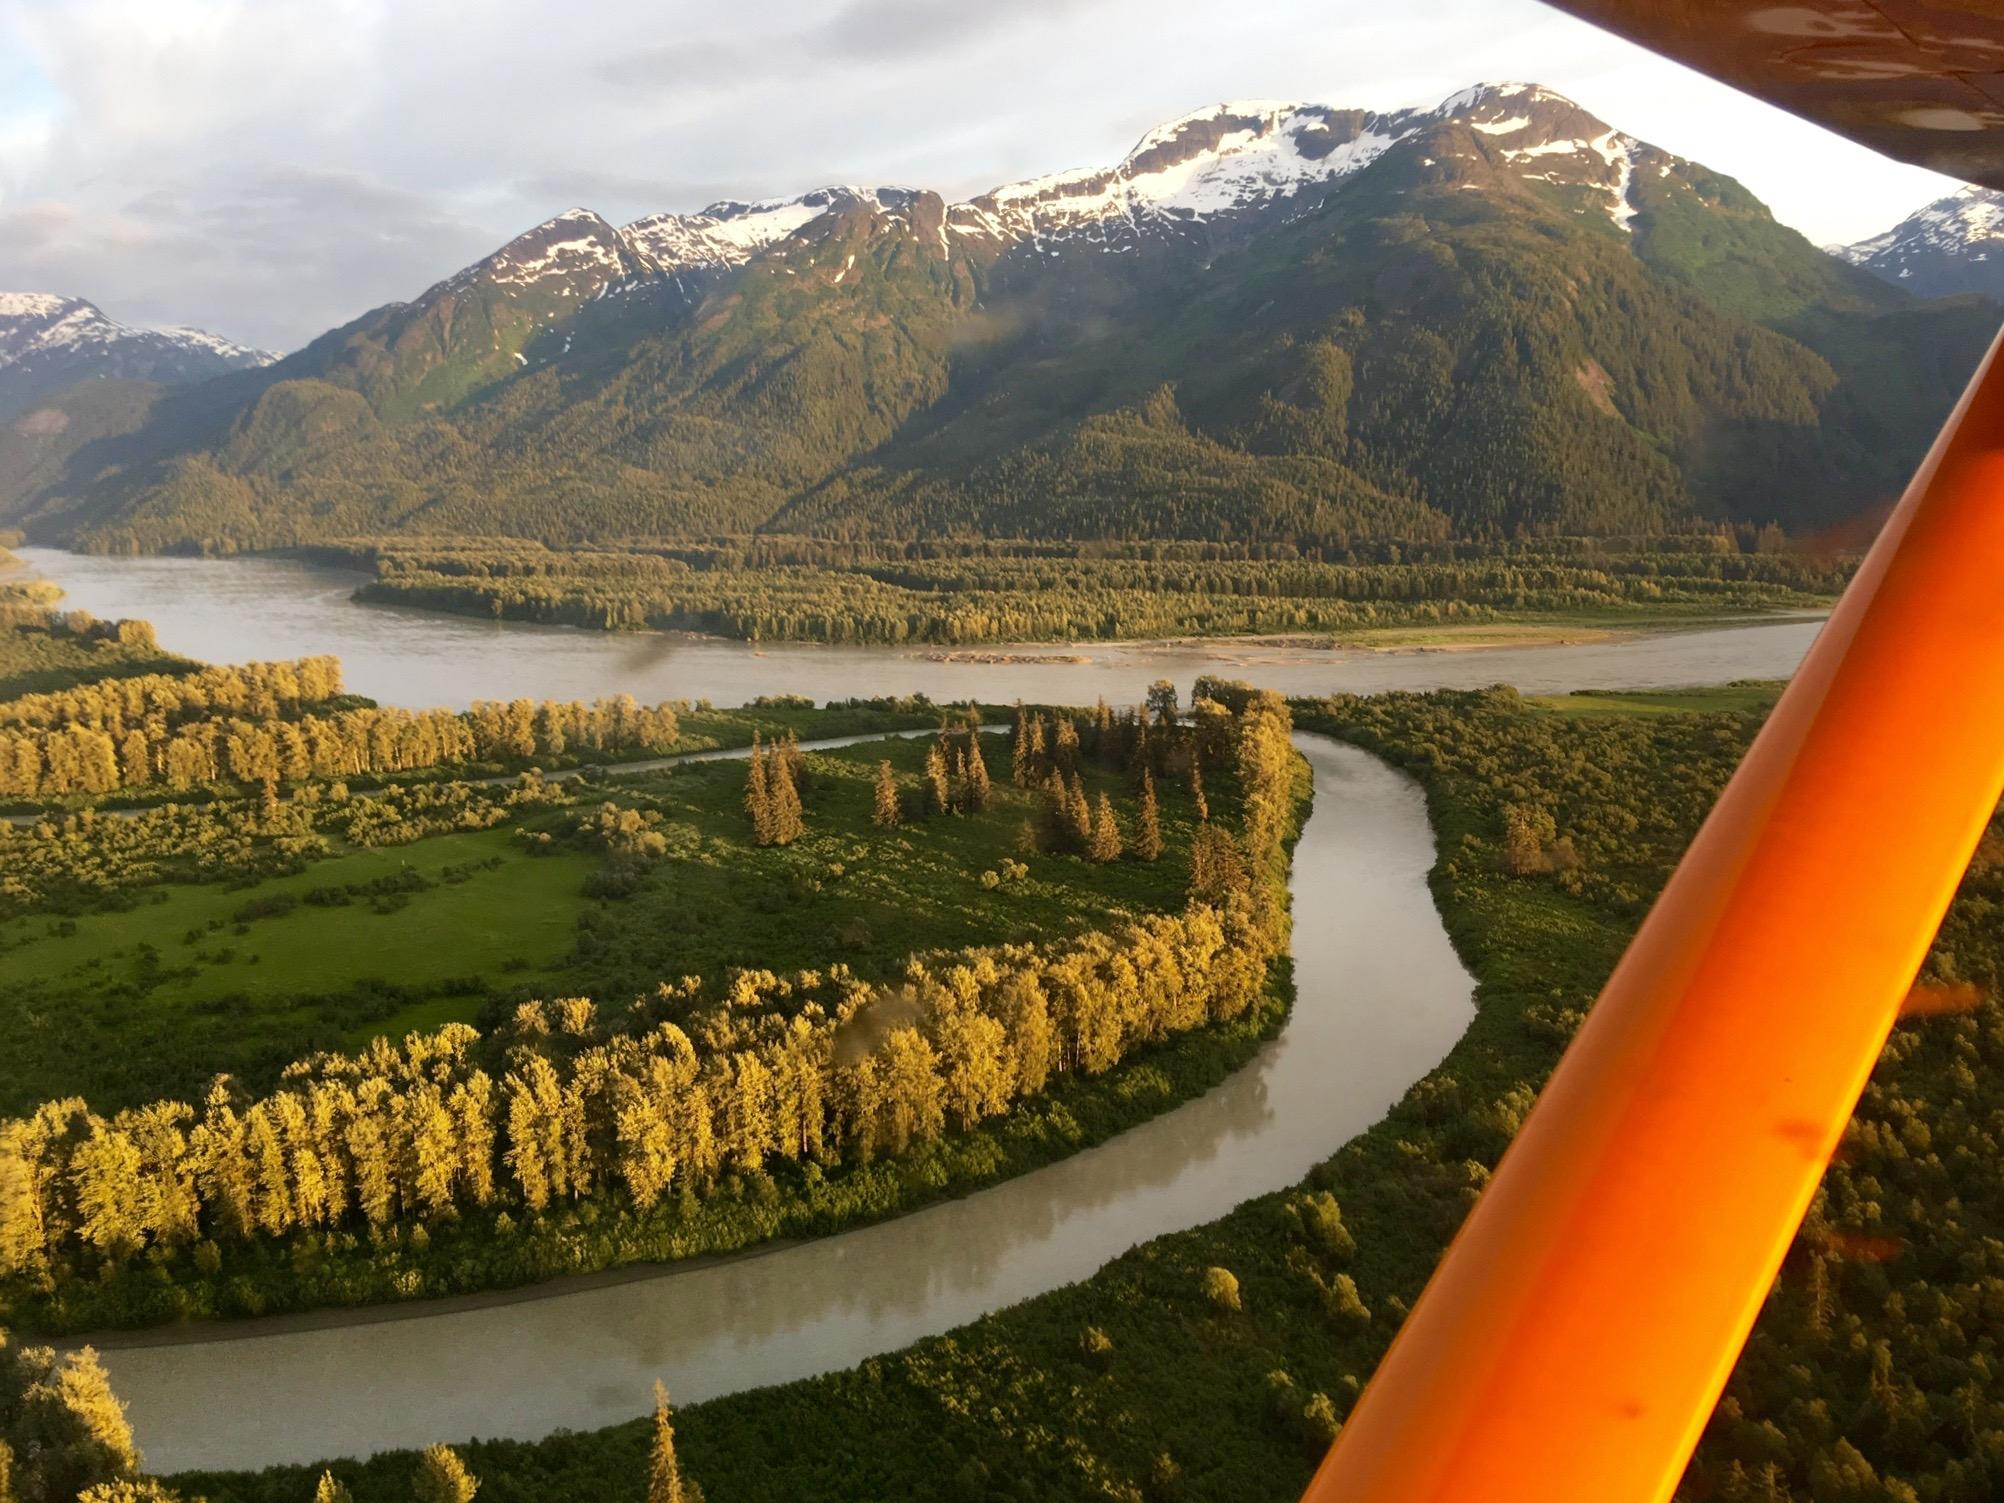 Sticking River Valley